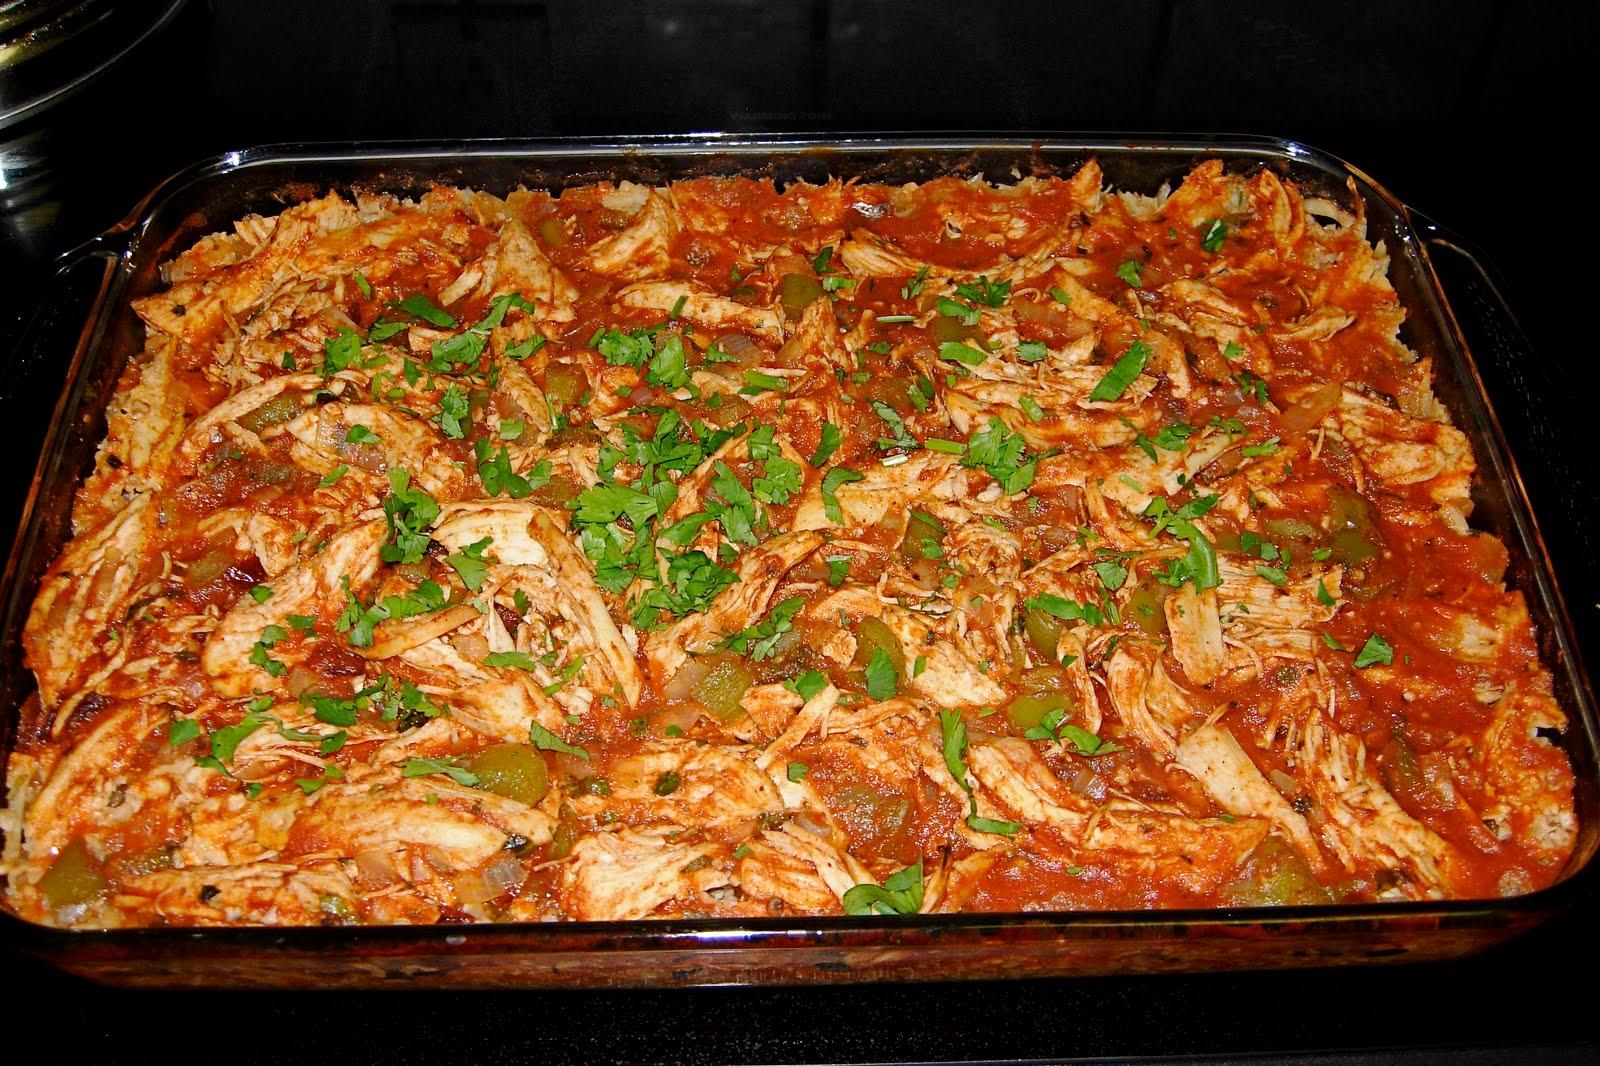 CFSCC presents: EAT THIS!: Paleo Chicken Enchilada Bake